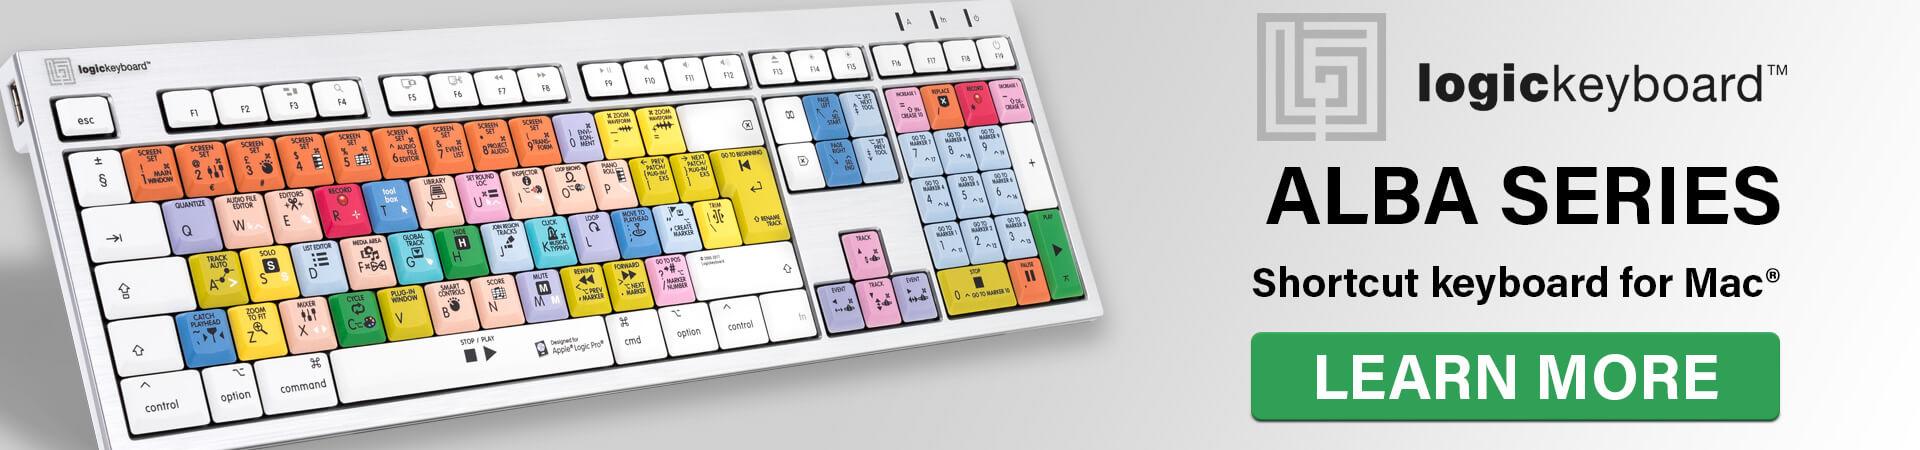 Logickeyboard Alba Series